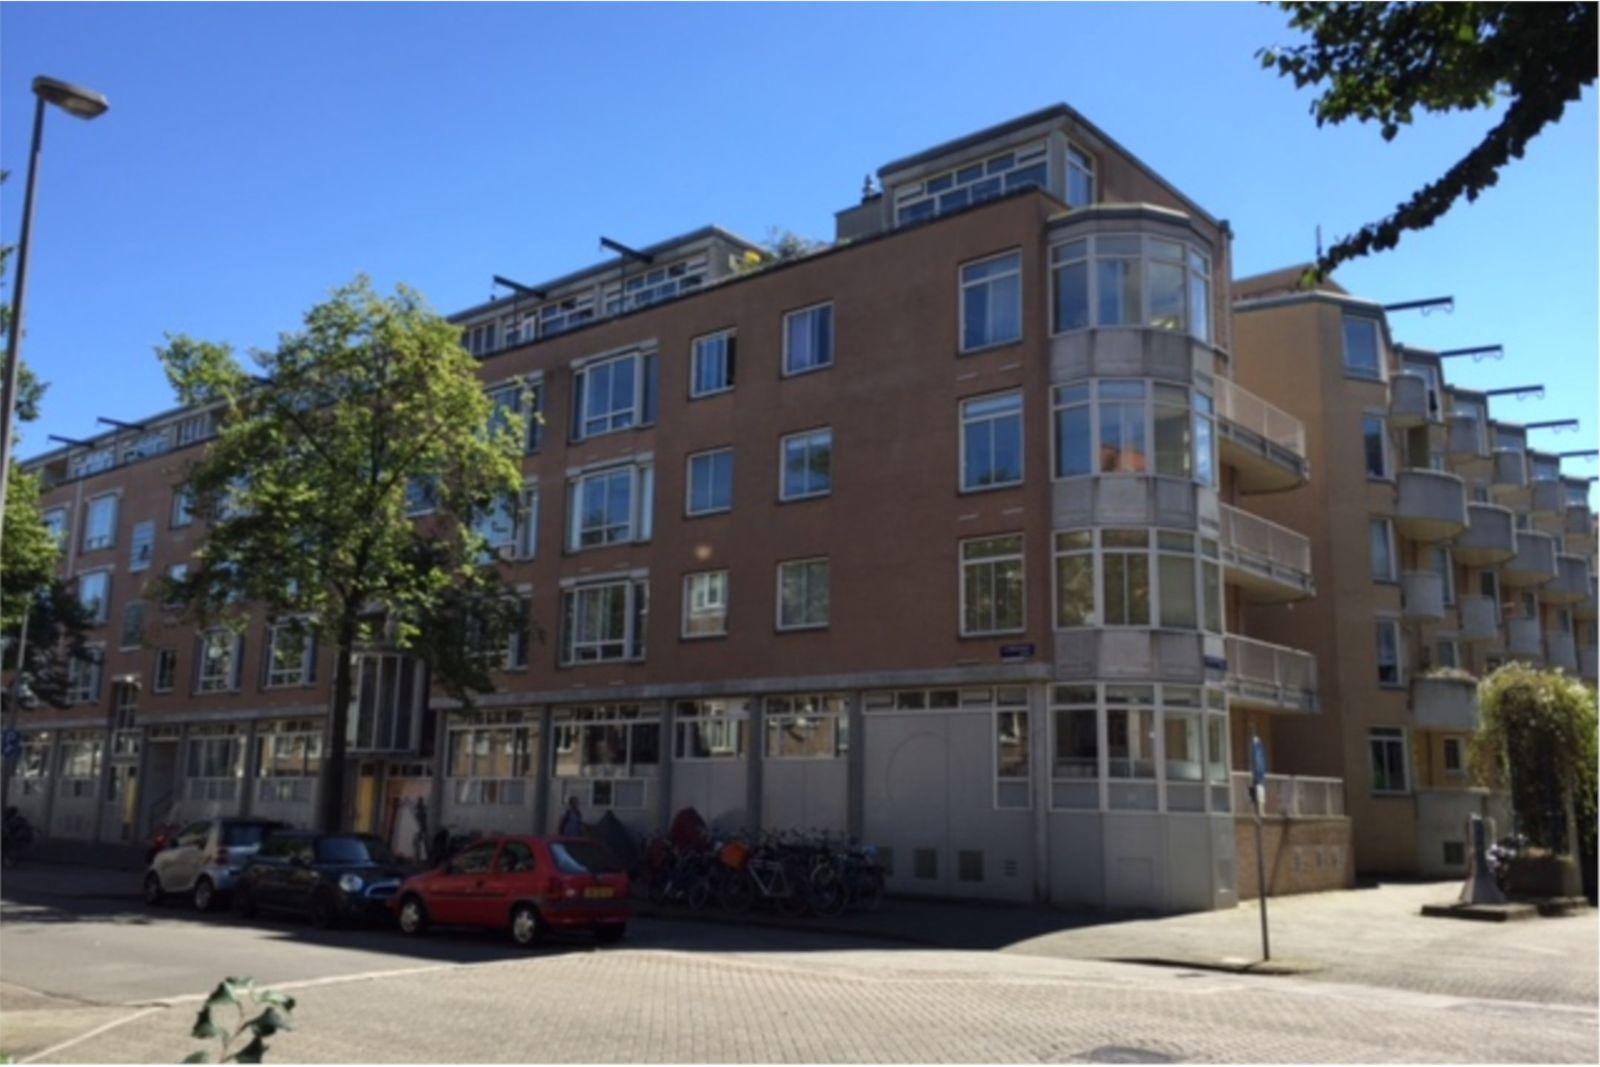 Avercampstraat 29, Amsterdam